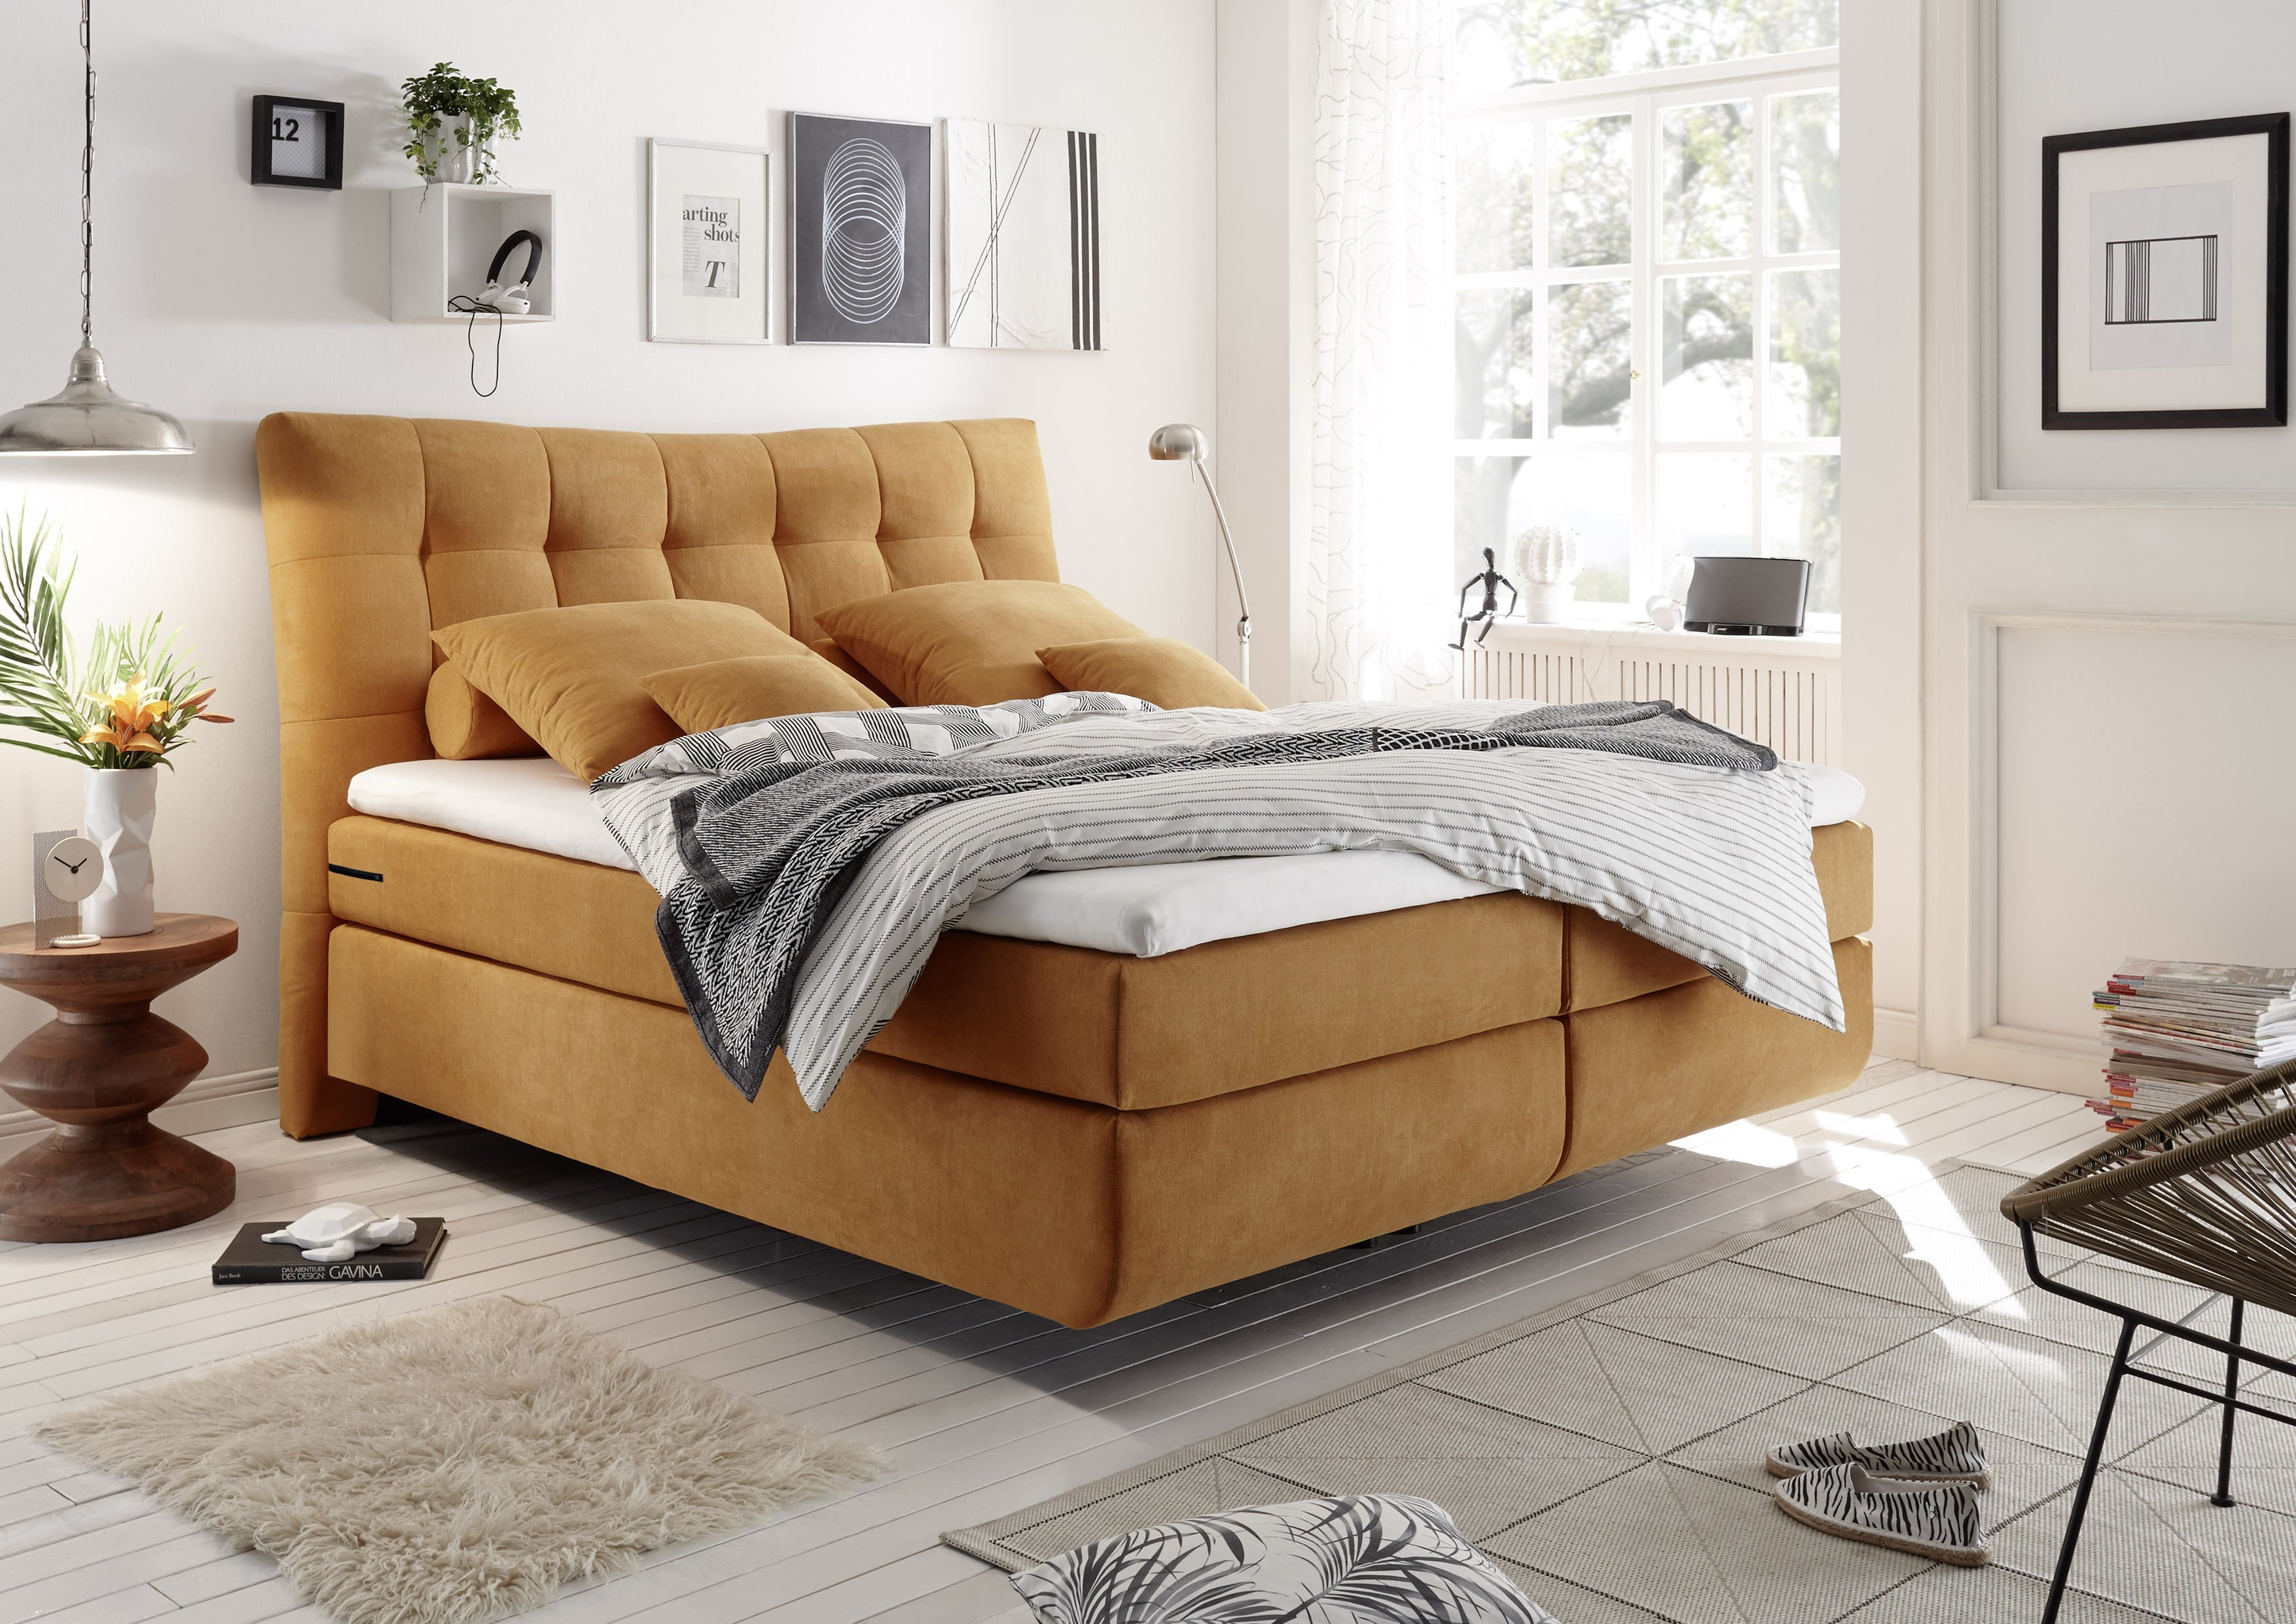 black red white boxspringbett malibu in safran inklusive topper m bel letz ihr online shop. Black Bedroom Furniture Sets. Home Design Ideas